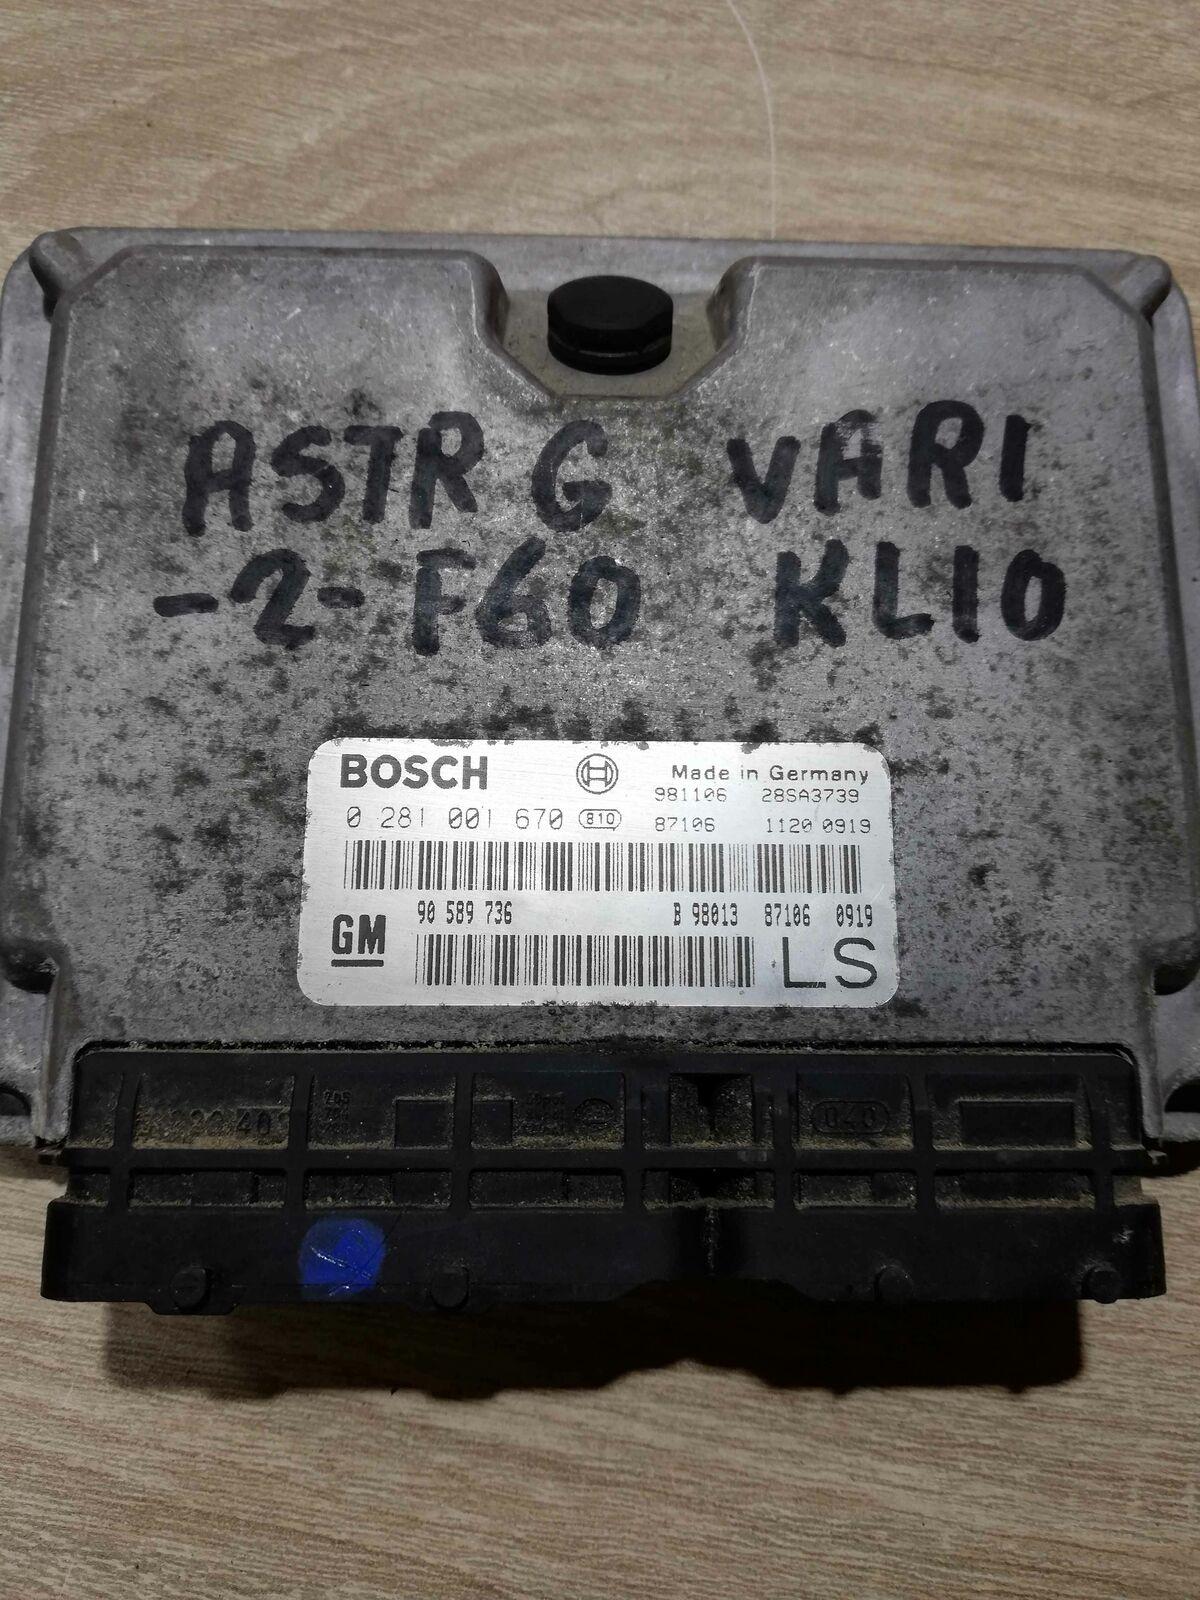 Bosch 0281001670 engine ECU Vauxhall Astra MK4 DTI 1.7 X17DTL 68HP 90589736 LS